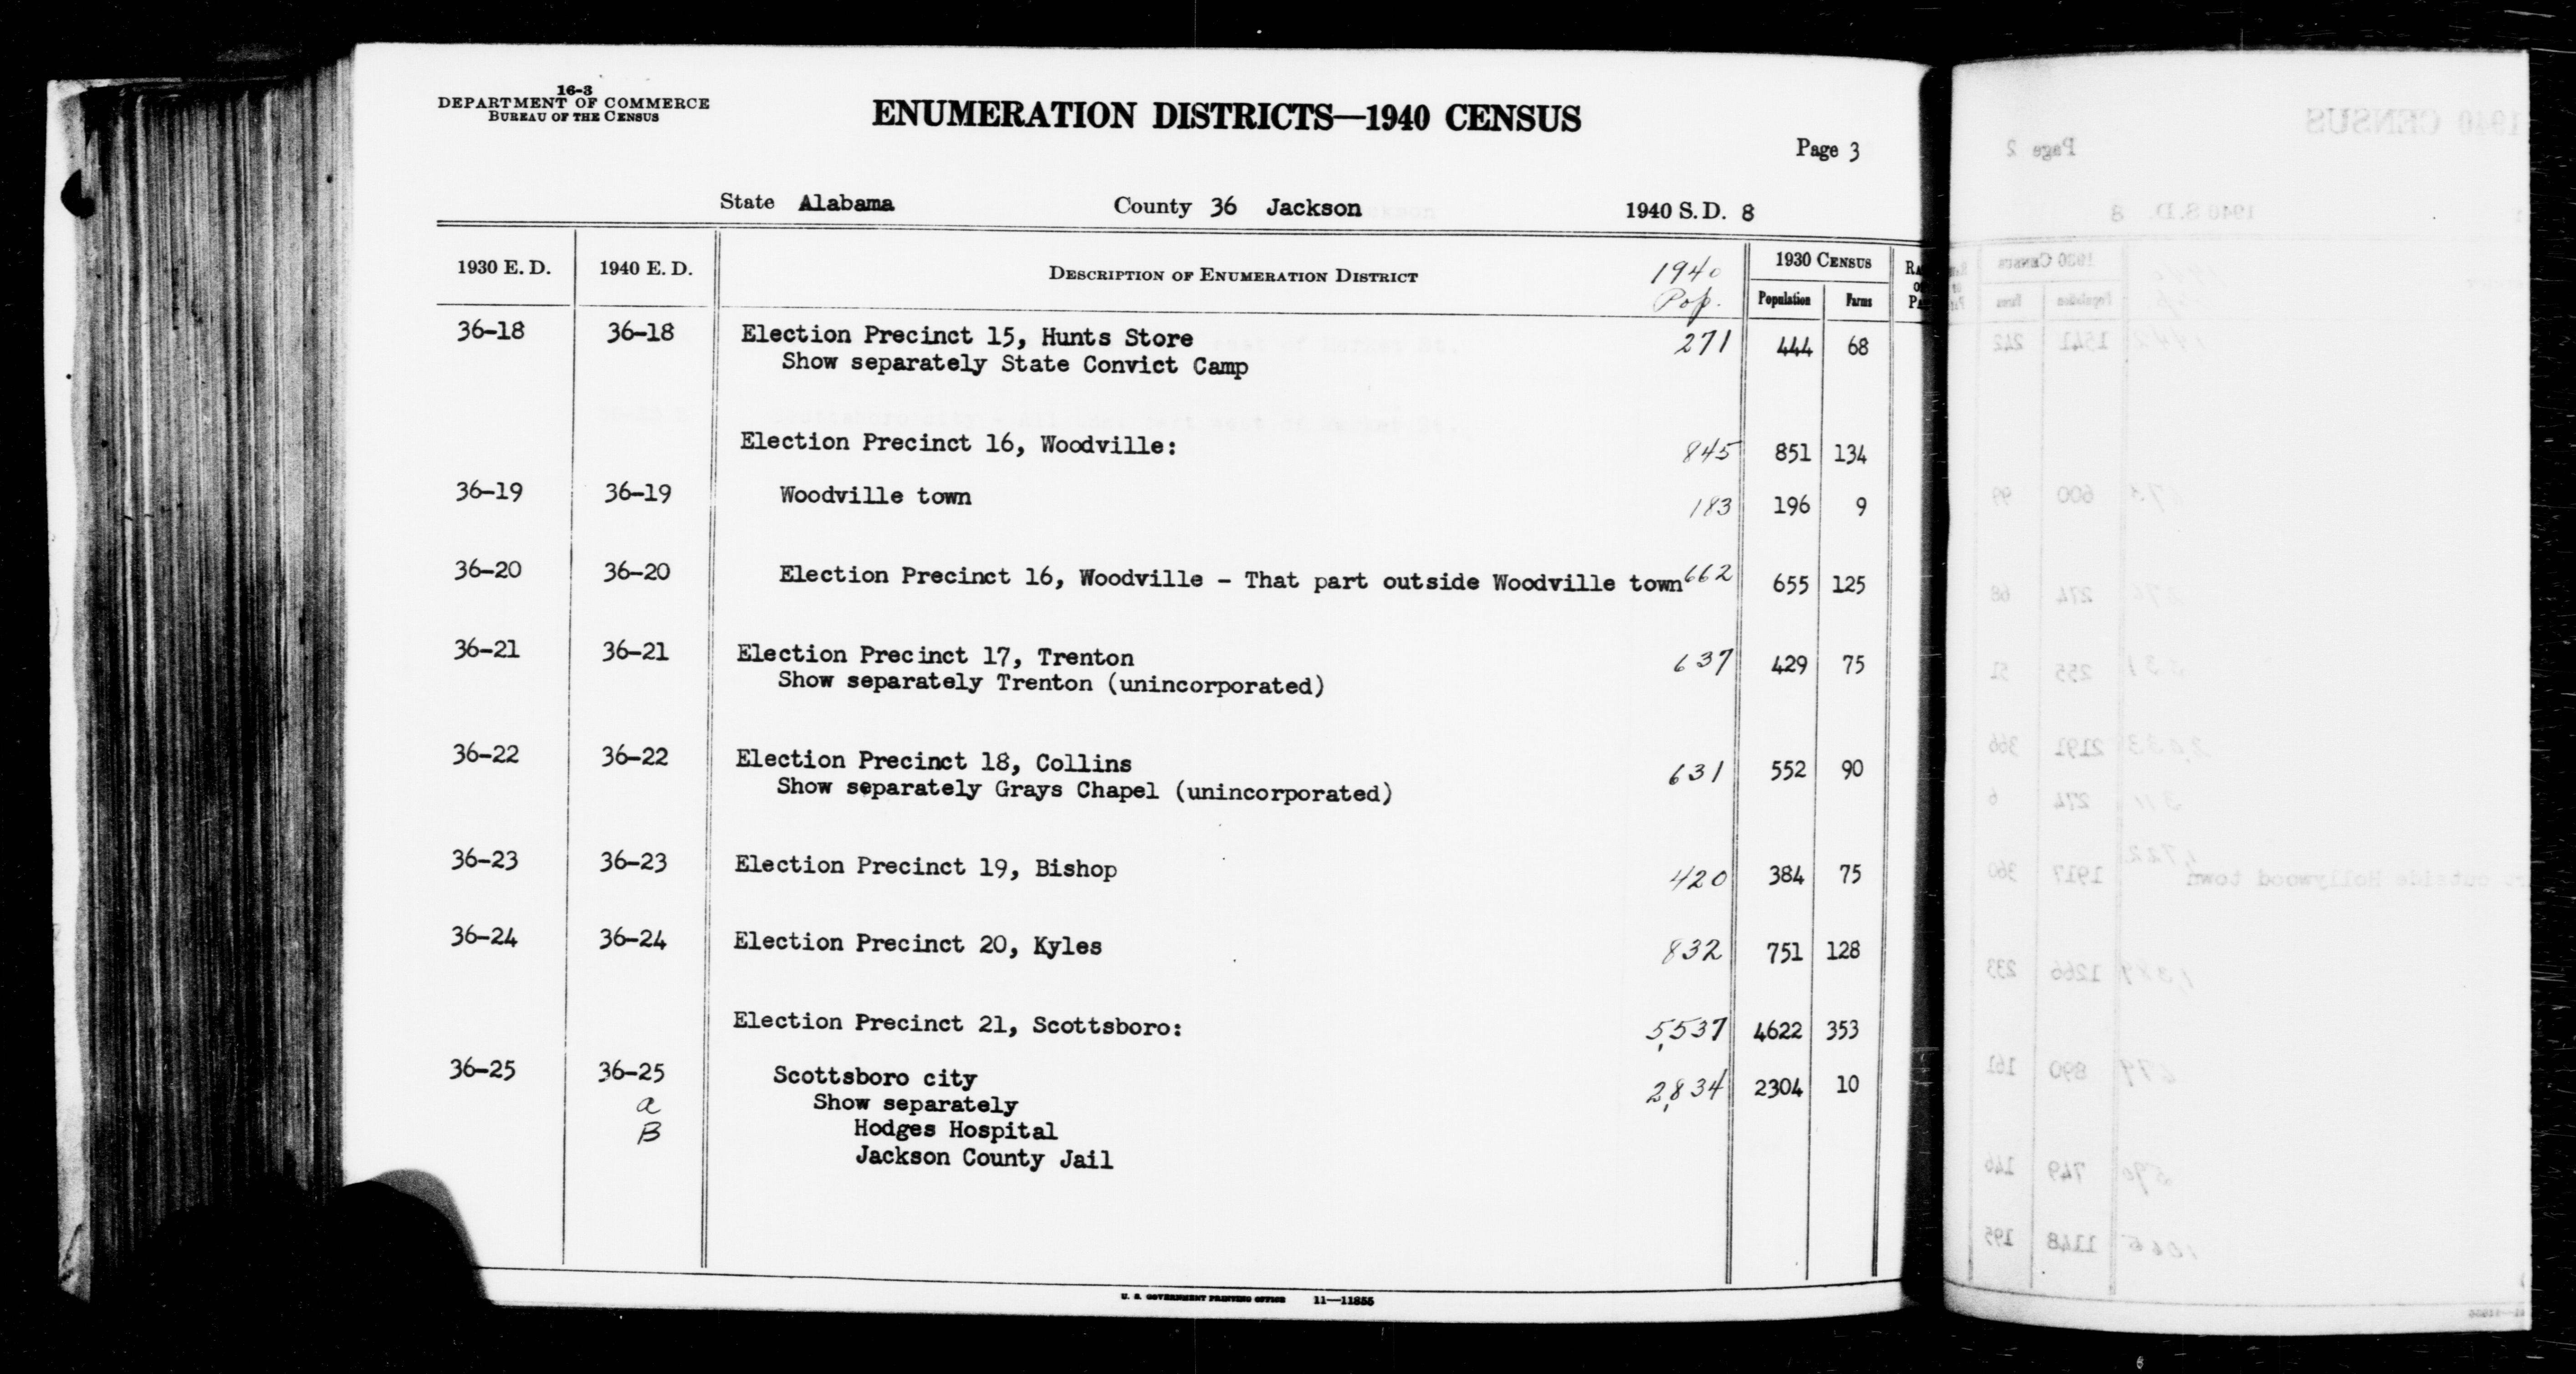 1940 Census Enumeration District Descriptions - Alabama - Jackson County - ED 36-18, ED 36-19, ED 36-20, ED 36-21, ED 36-22, ED 36-23, ED 36-24, ED 36-25A, ED 36-25B